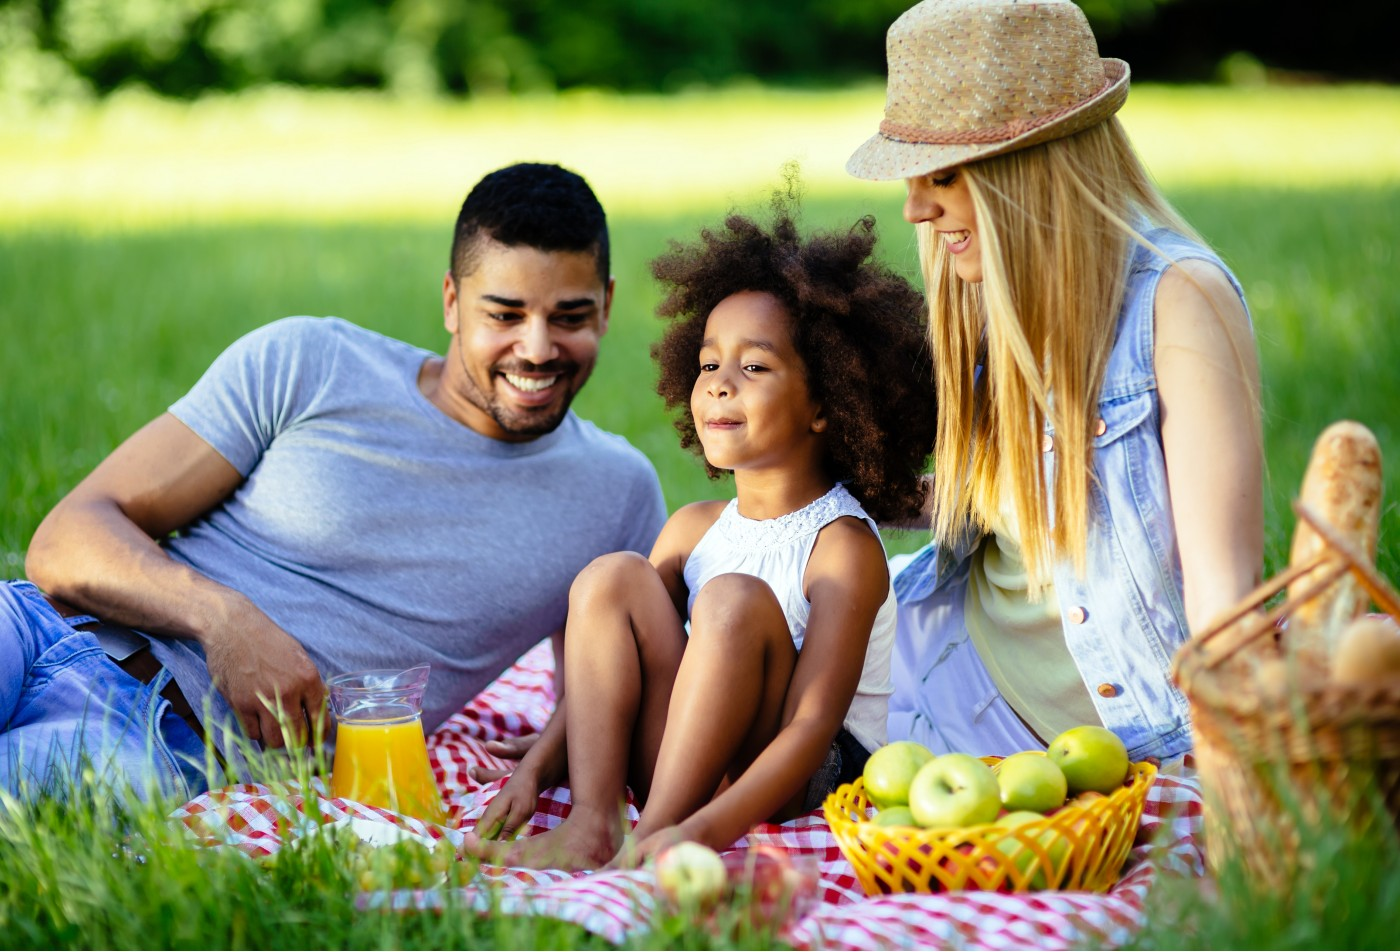 Family enjoying a picnic